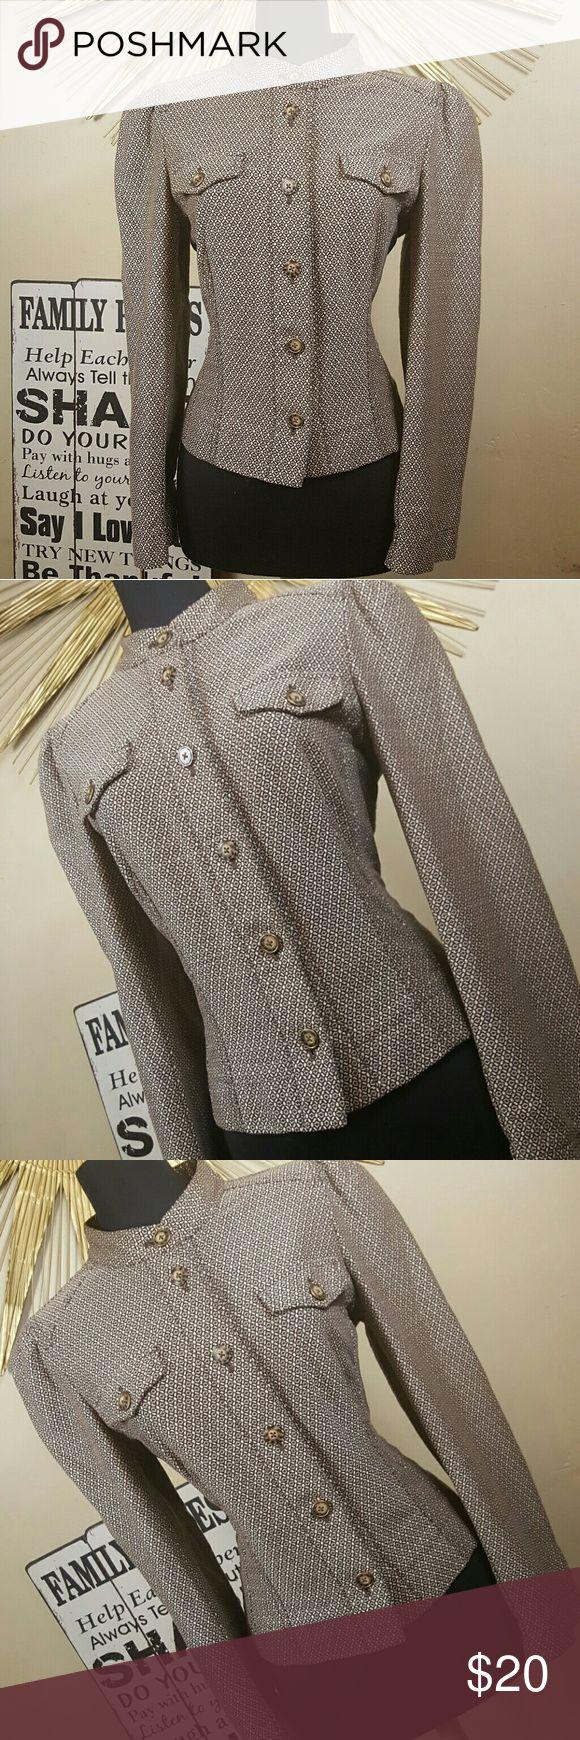 Ann Taylor Loft Career Blazer Jacket Excellent Condition. Tweed Feel.   Approximate Measurements: Bust 20.5' Sleeve 25' LOFT Jackets & Coats Blazers